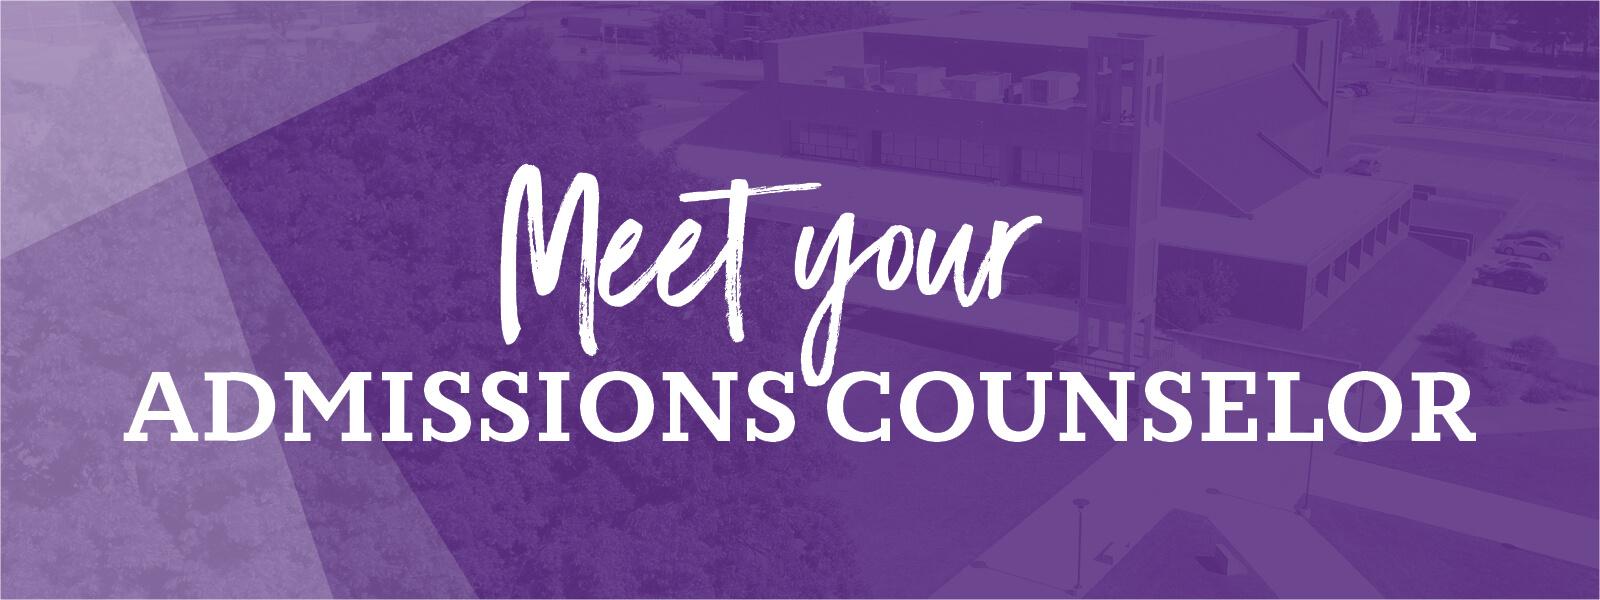 Counselors - Duke Undergraduate Admissions